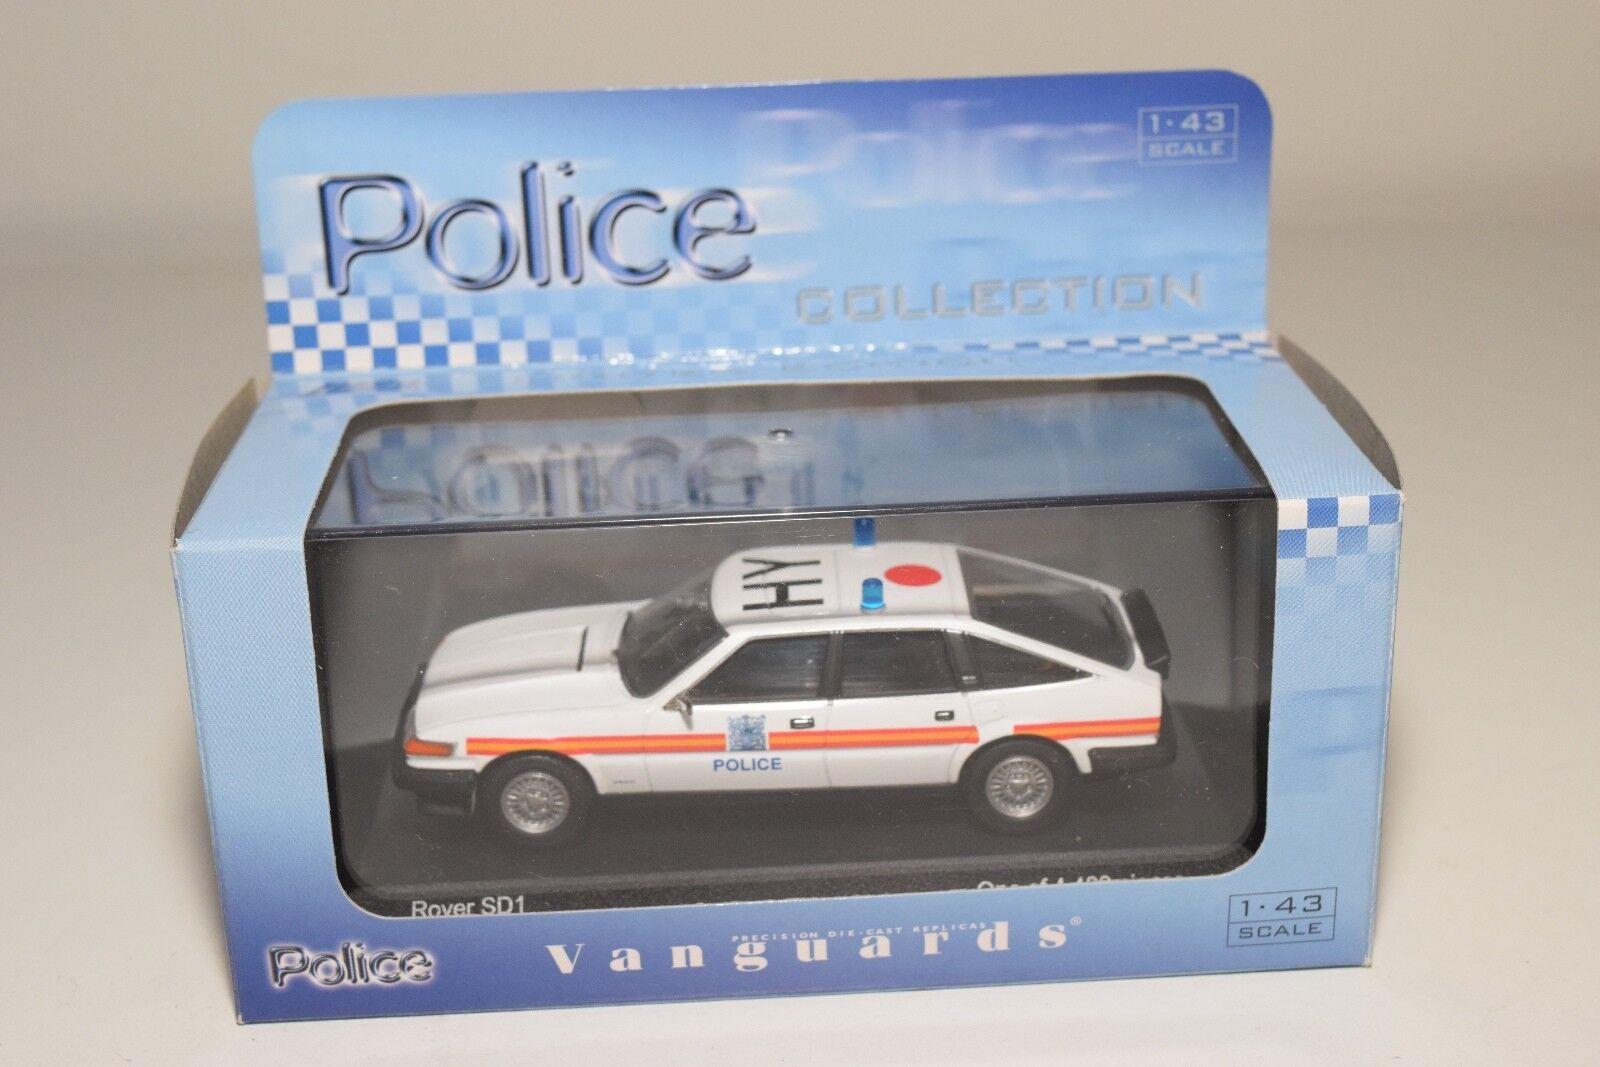 Kinderrennbahnen Elektrisches Spielzeug Practical Scalextric 6175 Opel Astra V8 CoupÉ #16 Bleekemolen Mb